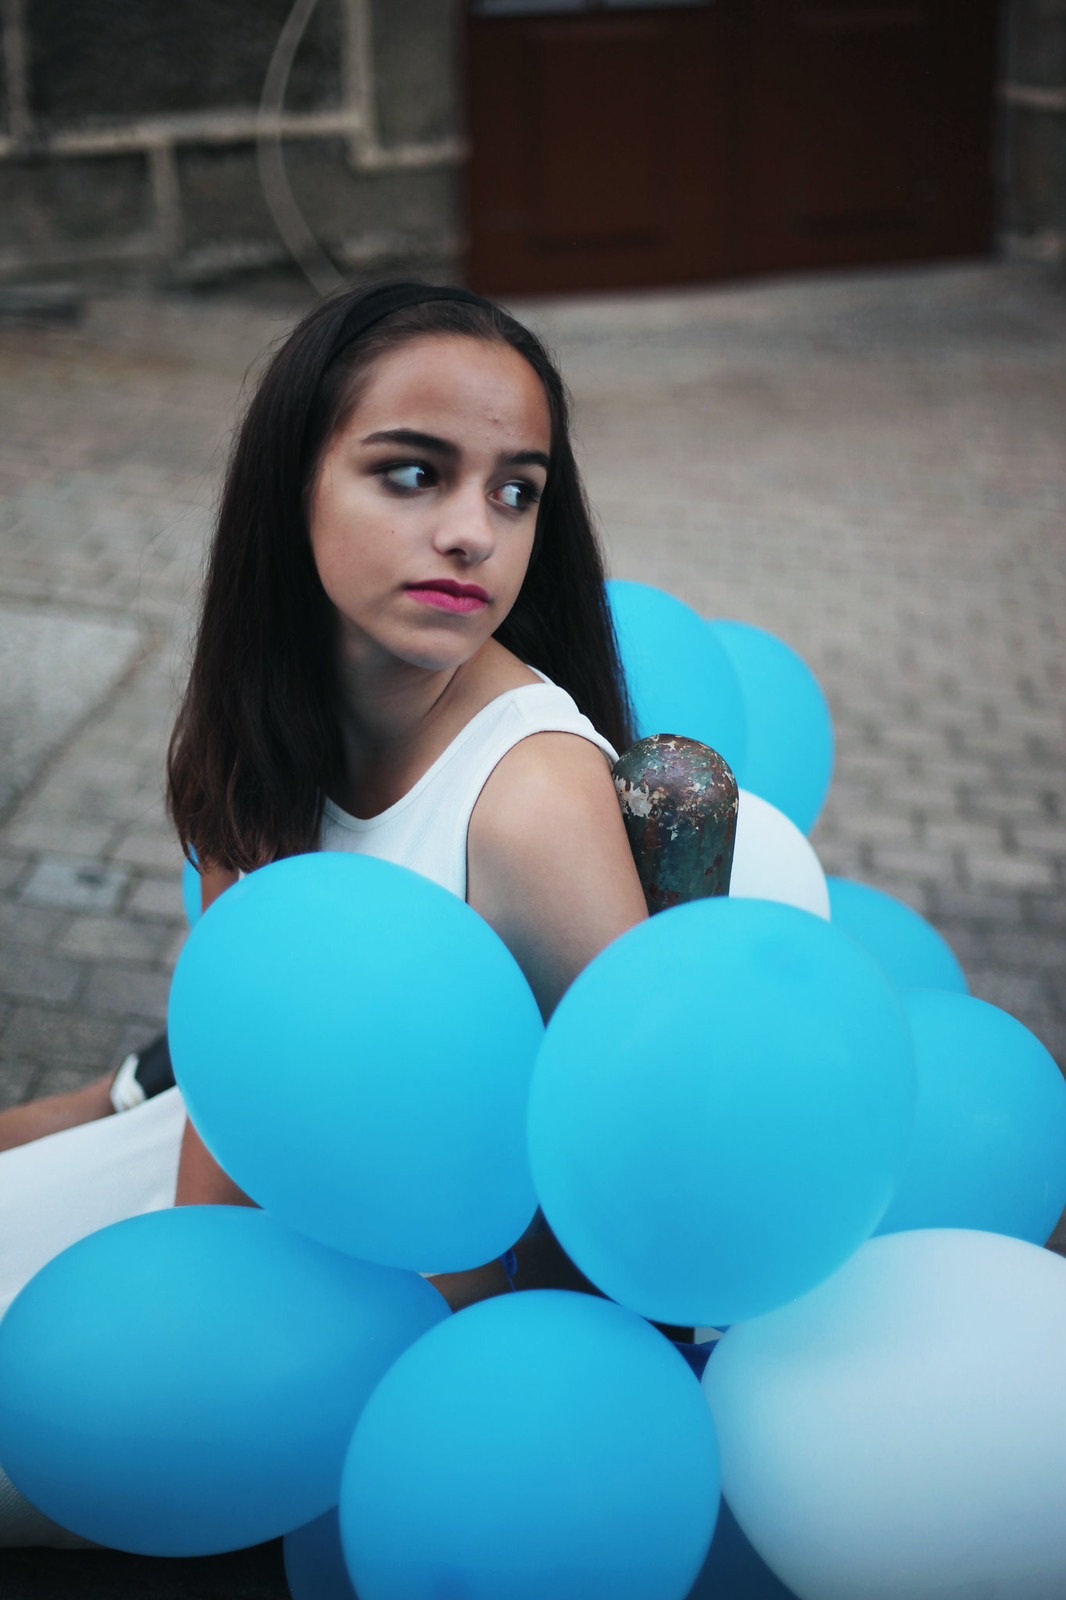 ballons | re-tra-tar